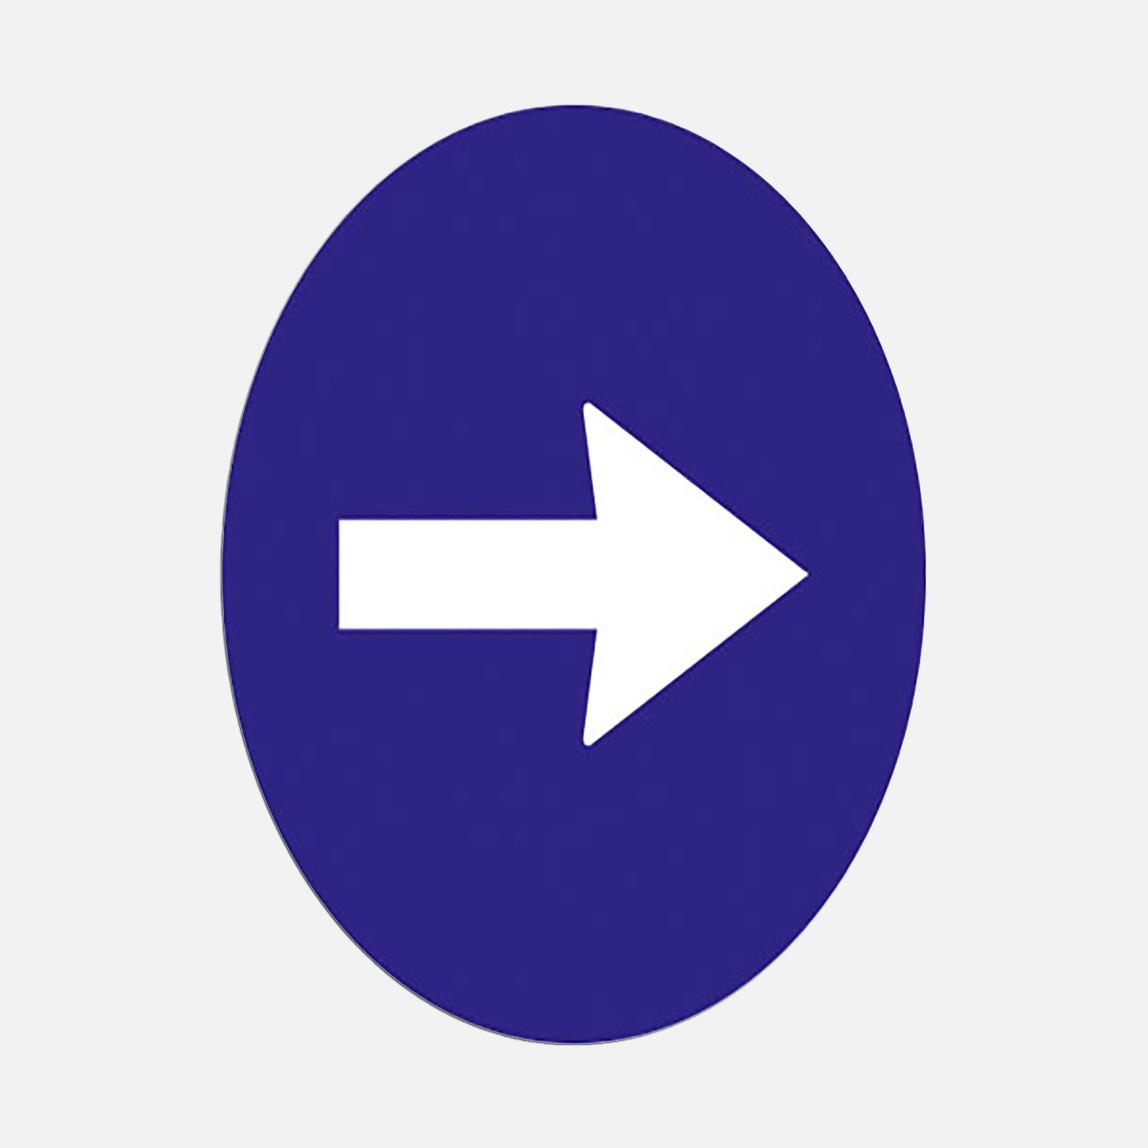 Vidalı Levha Sticker Etiketi 2'li -          -> ok